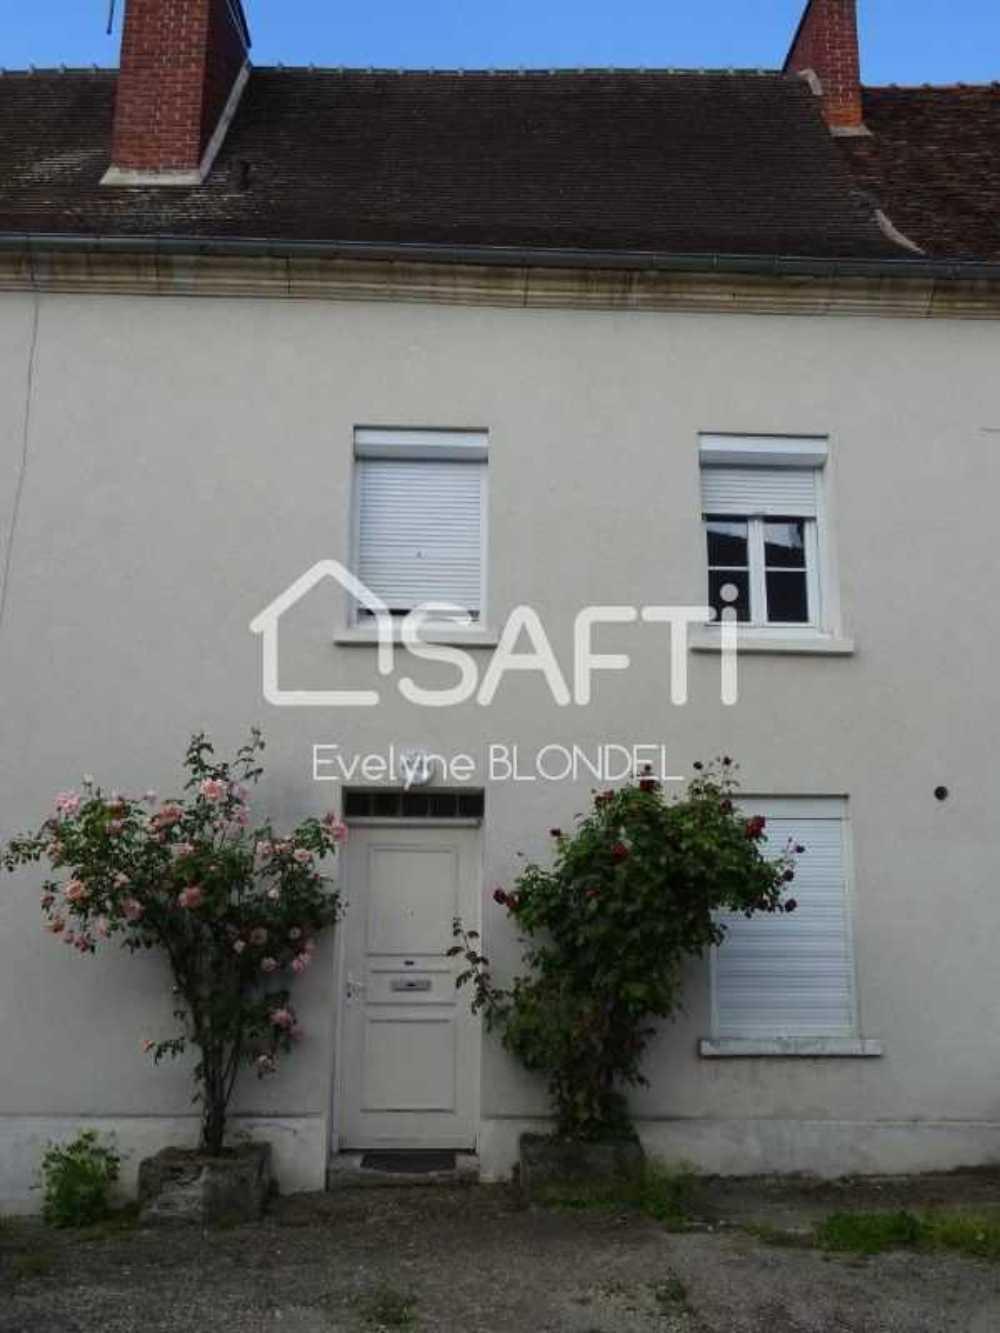 Clermont Oise Apartment Bild 4082961